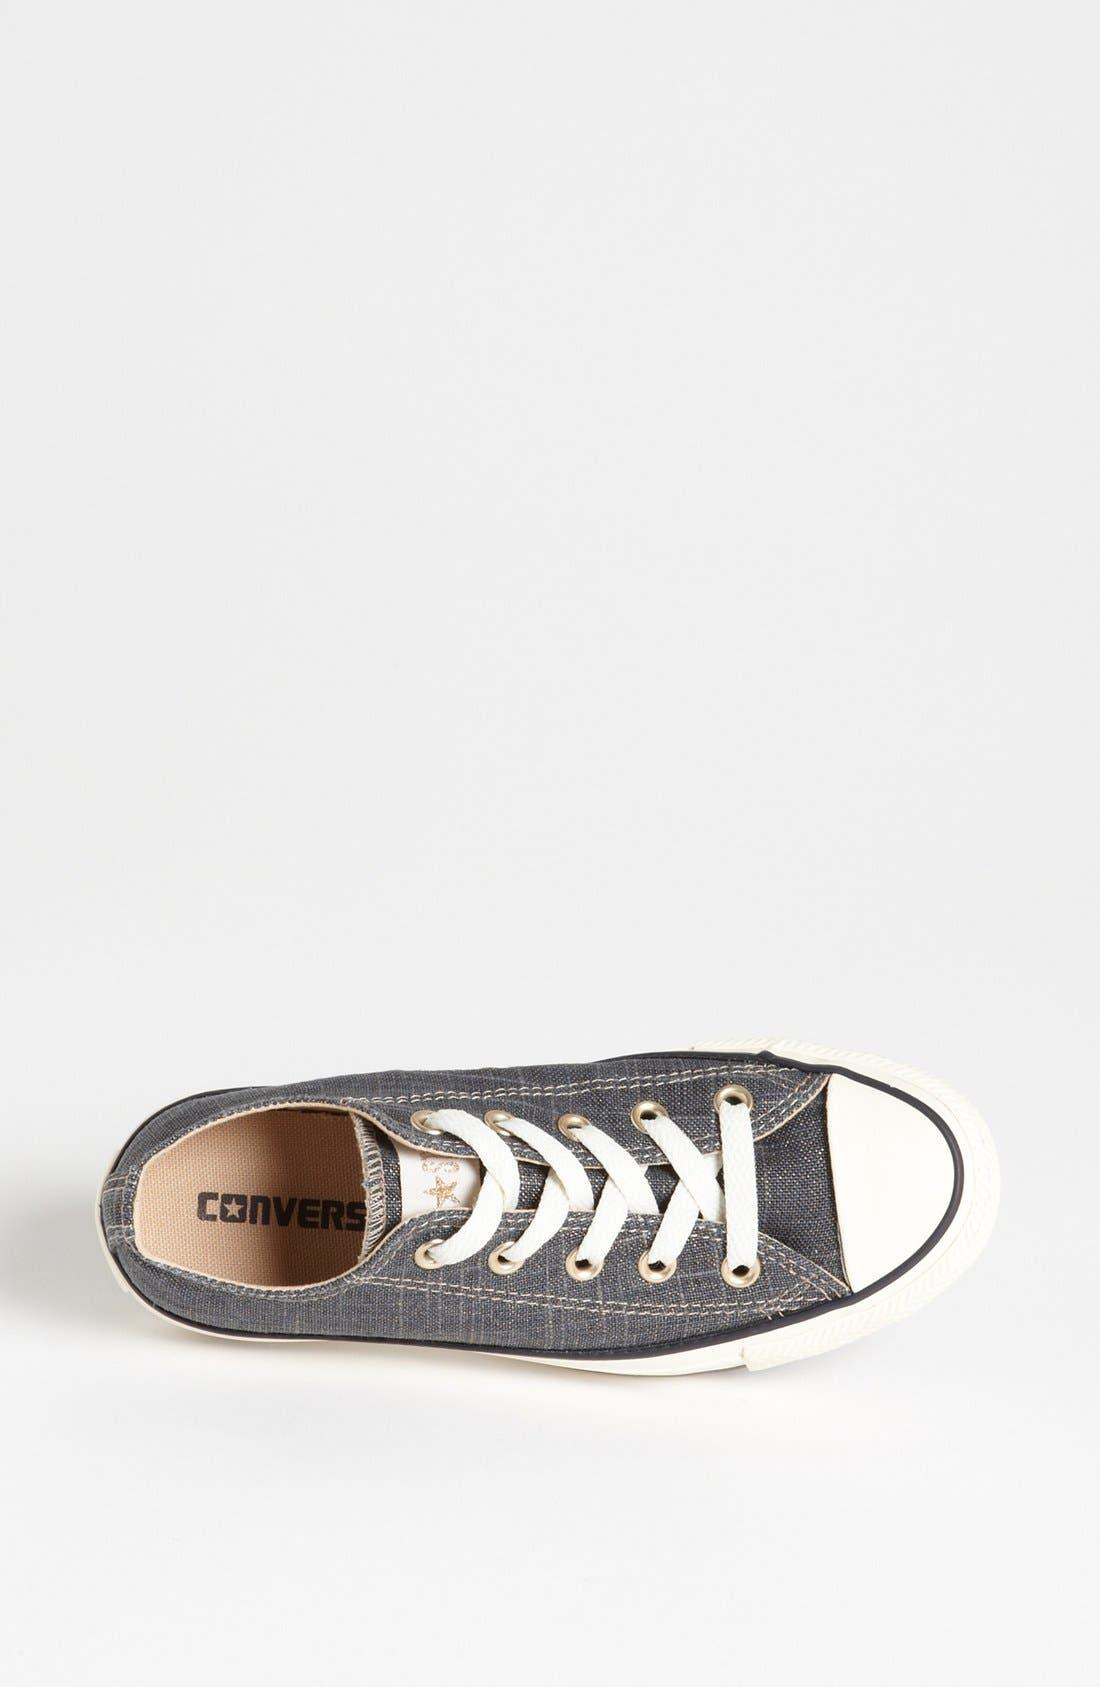 Alternate Image 3  - Converse Chuck Taylor® All Star® 'Textured' Sneaker (Women)